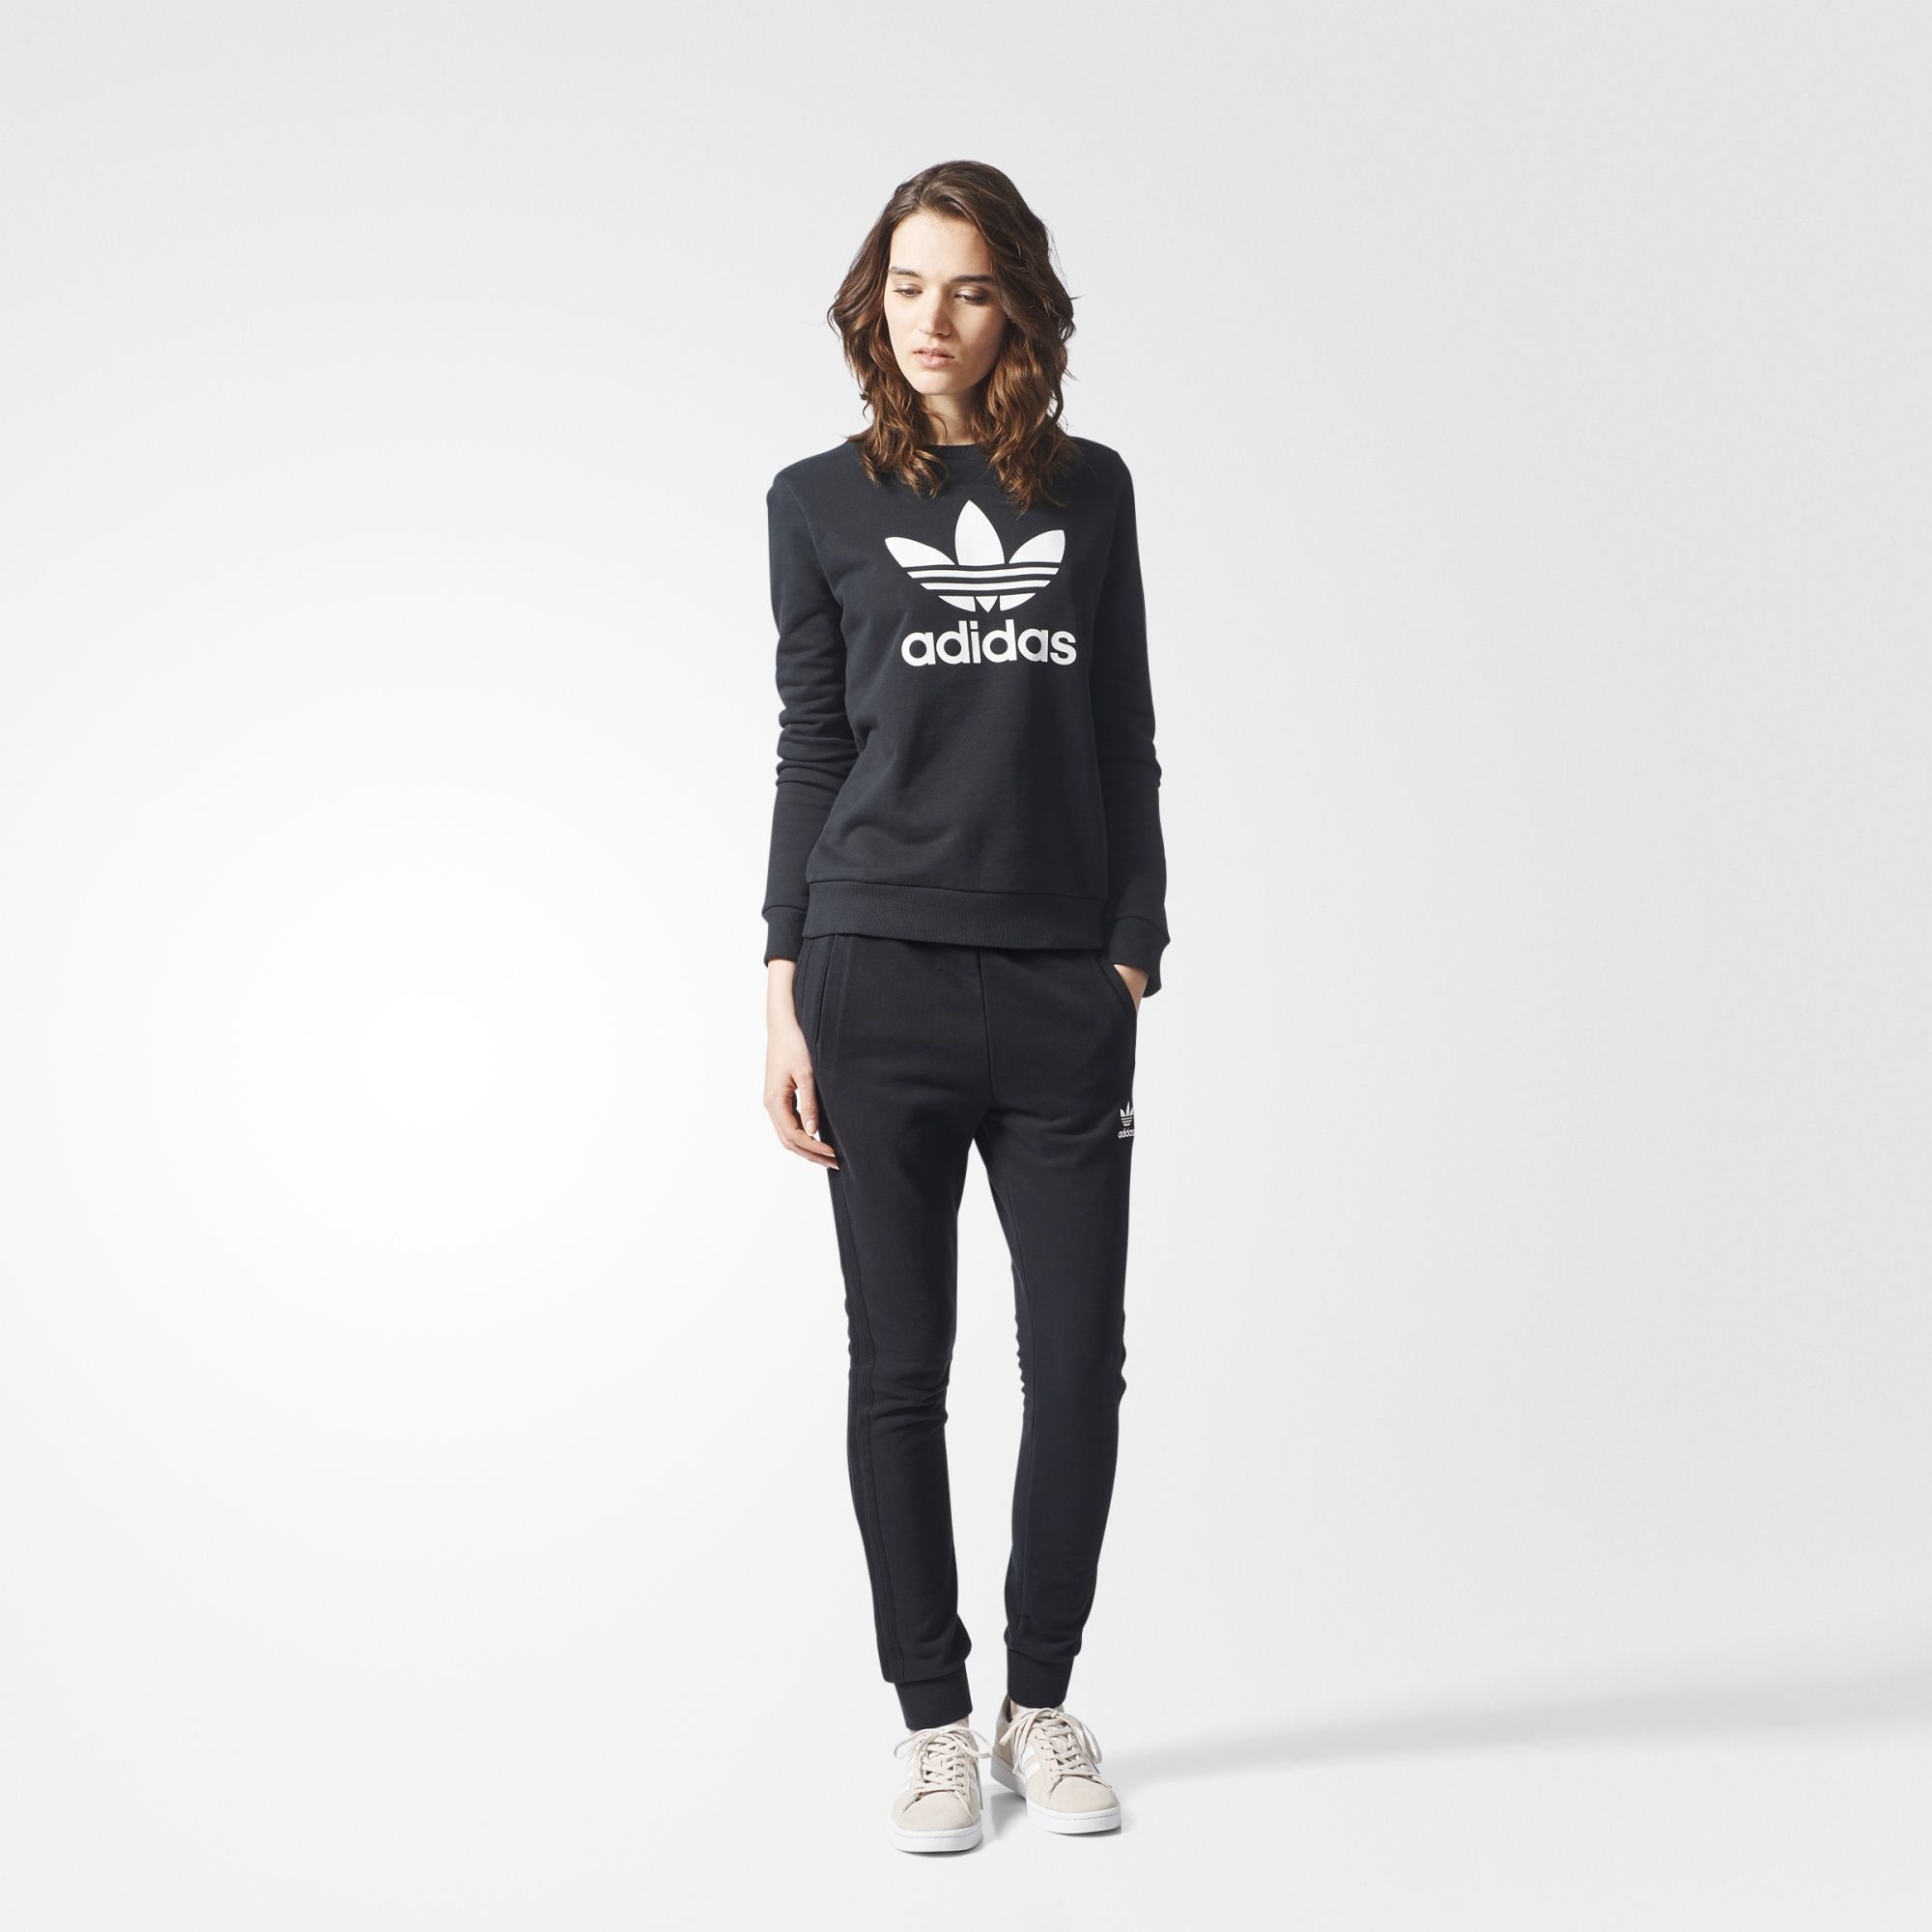 451ae0fa281a adidas - Slim Cuffed Track Pants   Wish List   Adidas, Adidas pants ...